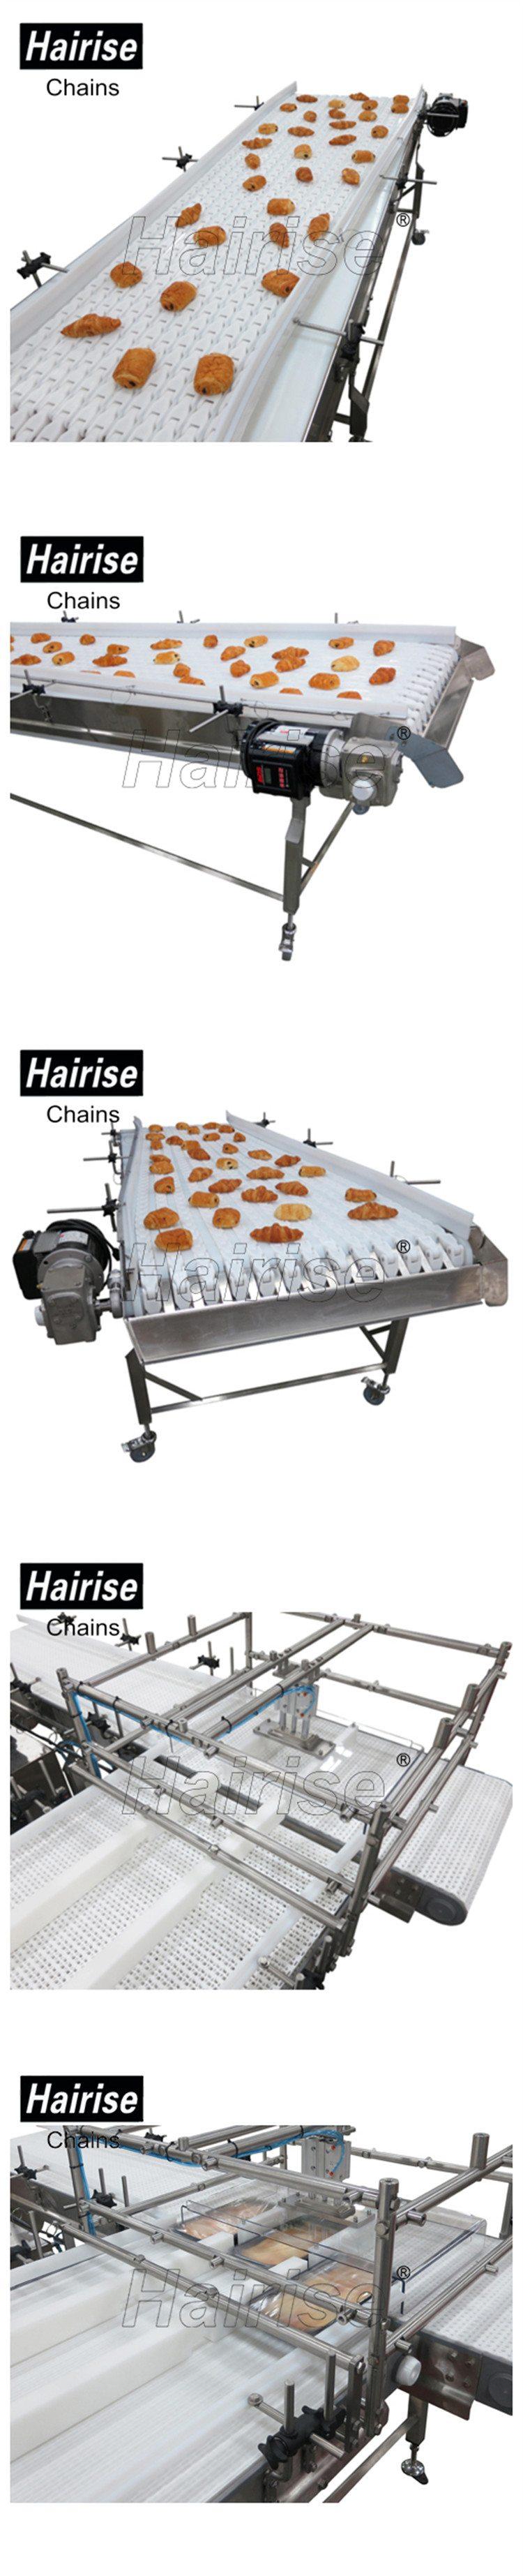 conveyor-for-bread